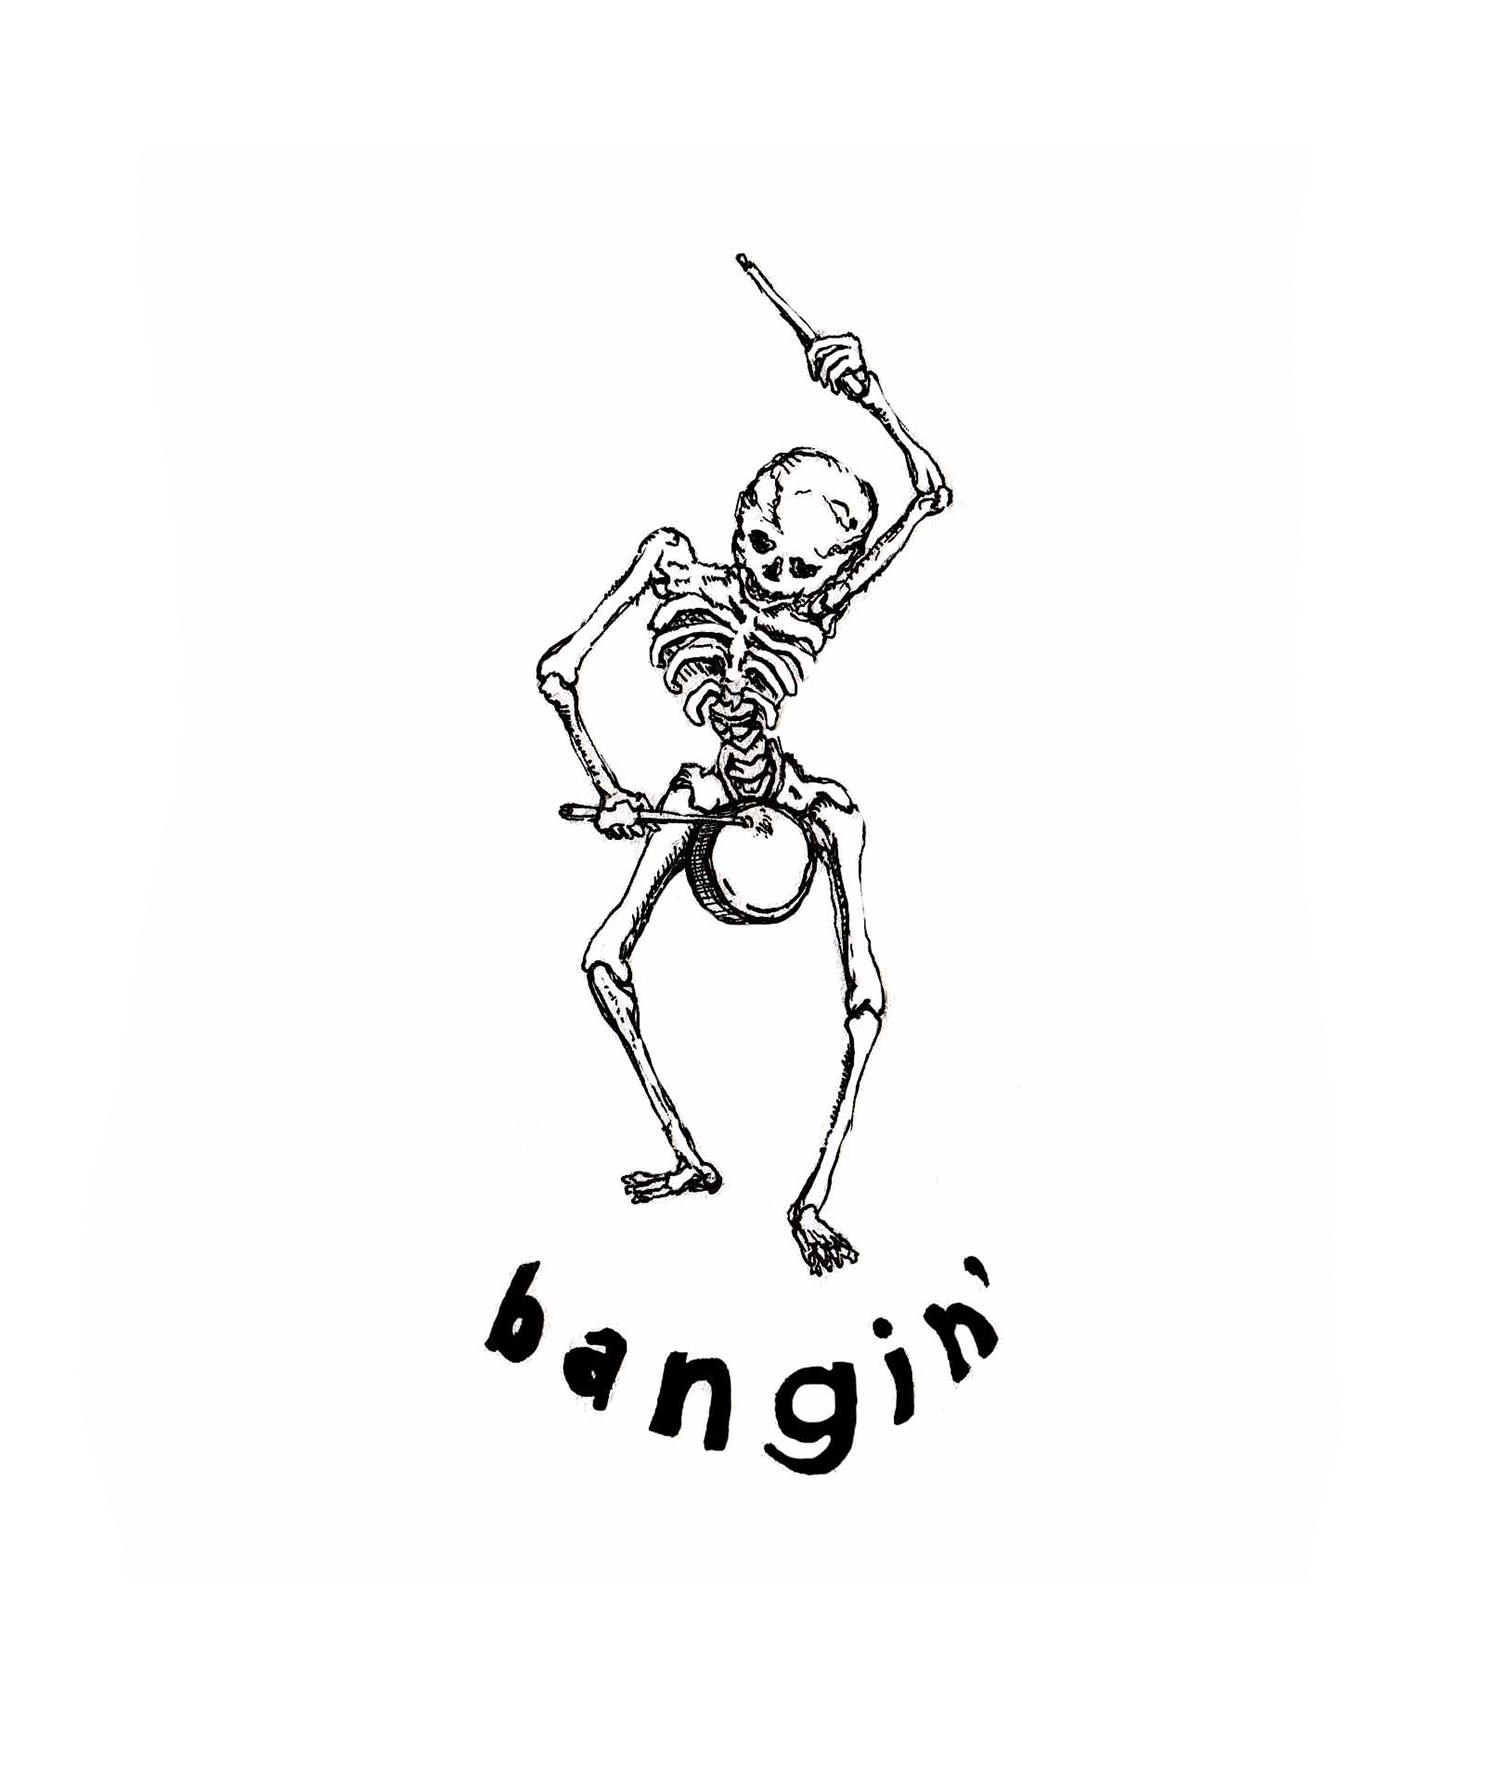 BANGIN_WEB.jpg